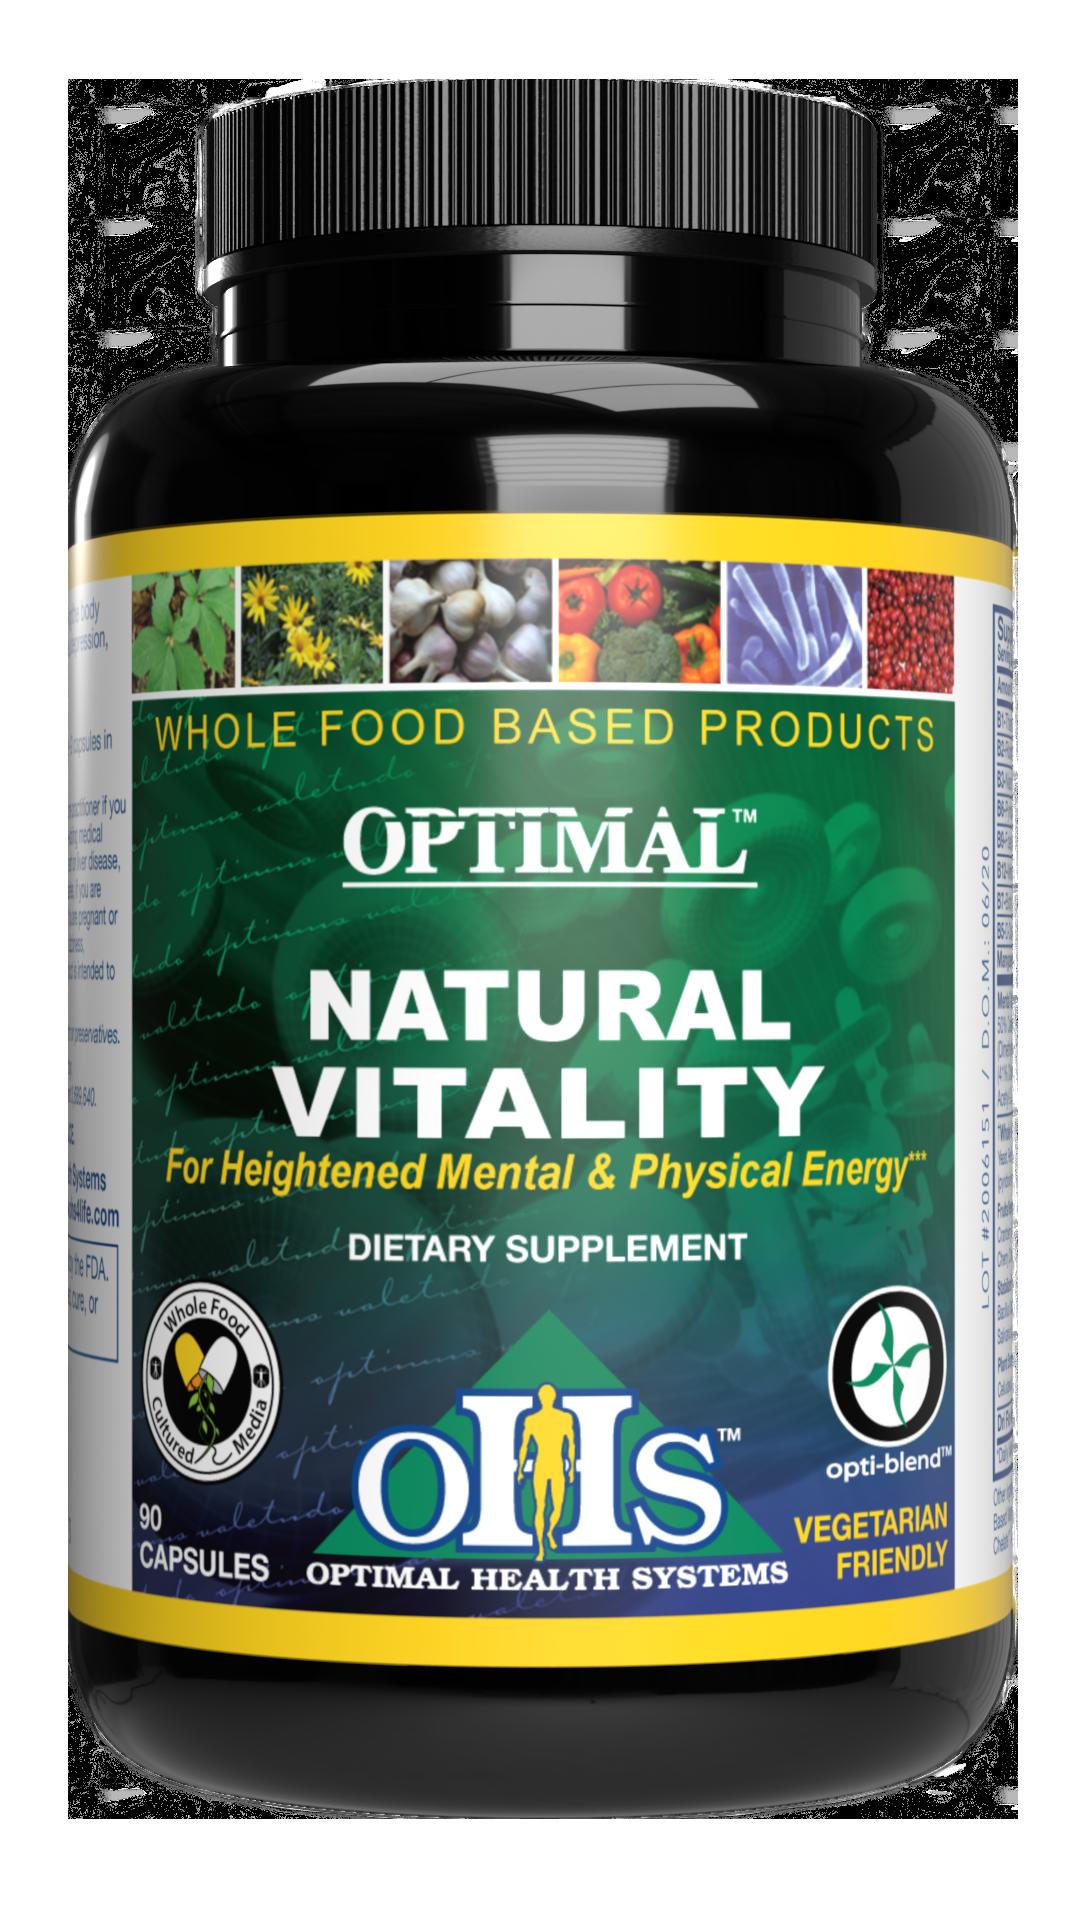 Optimal Natural Vitality